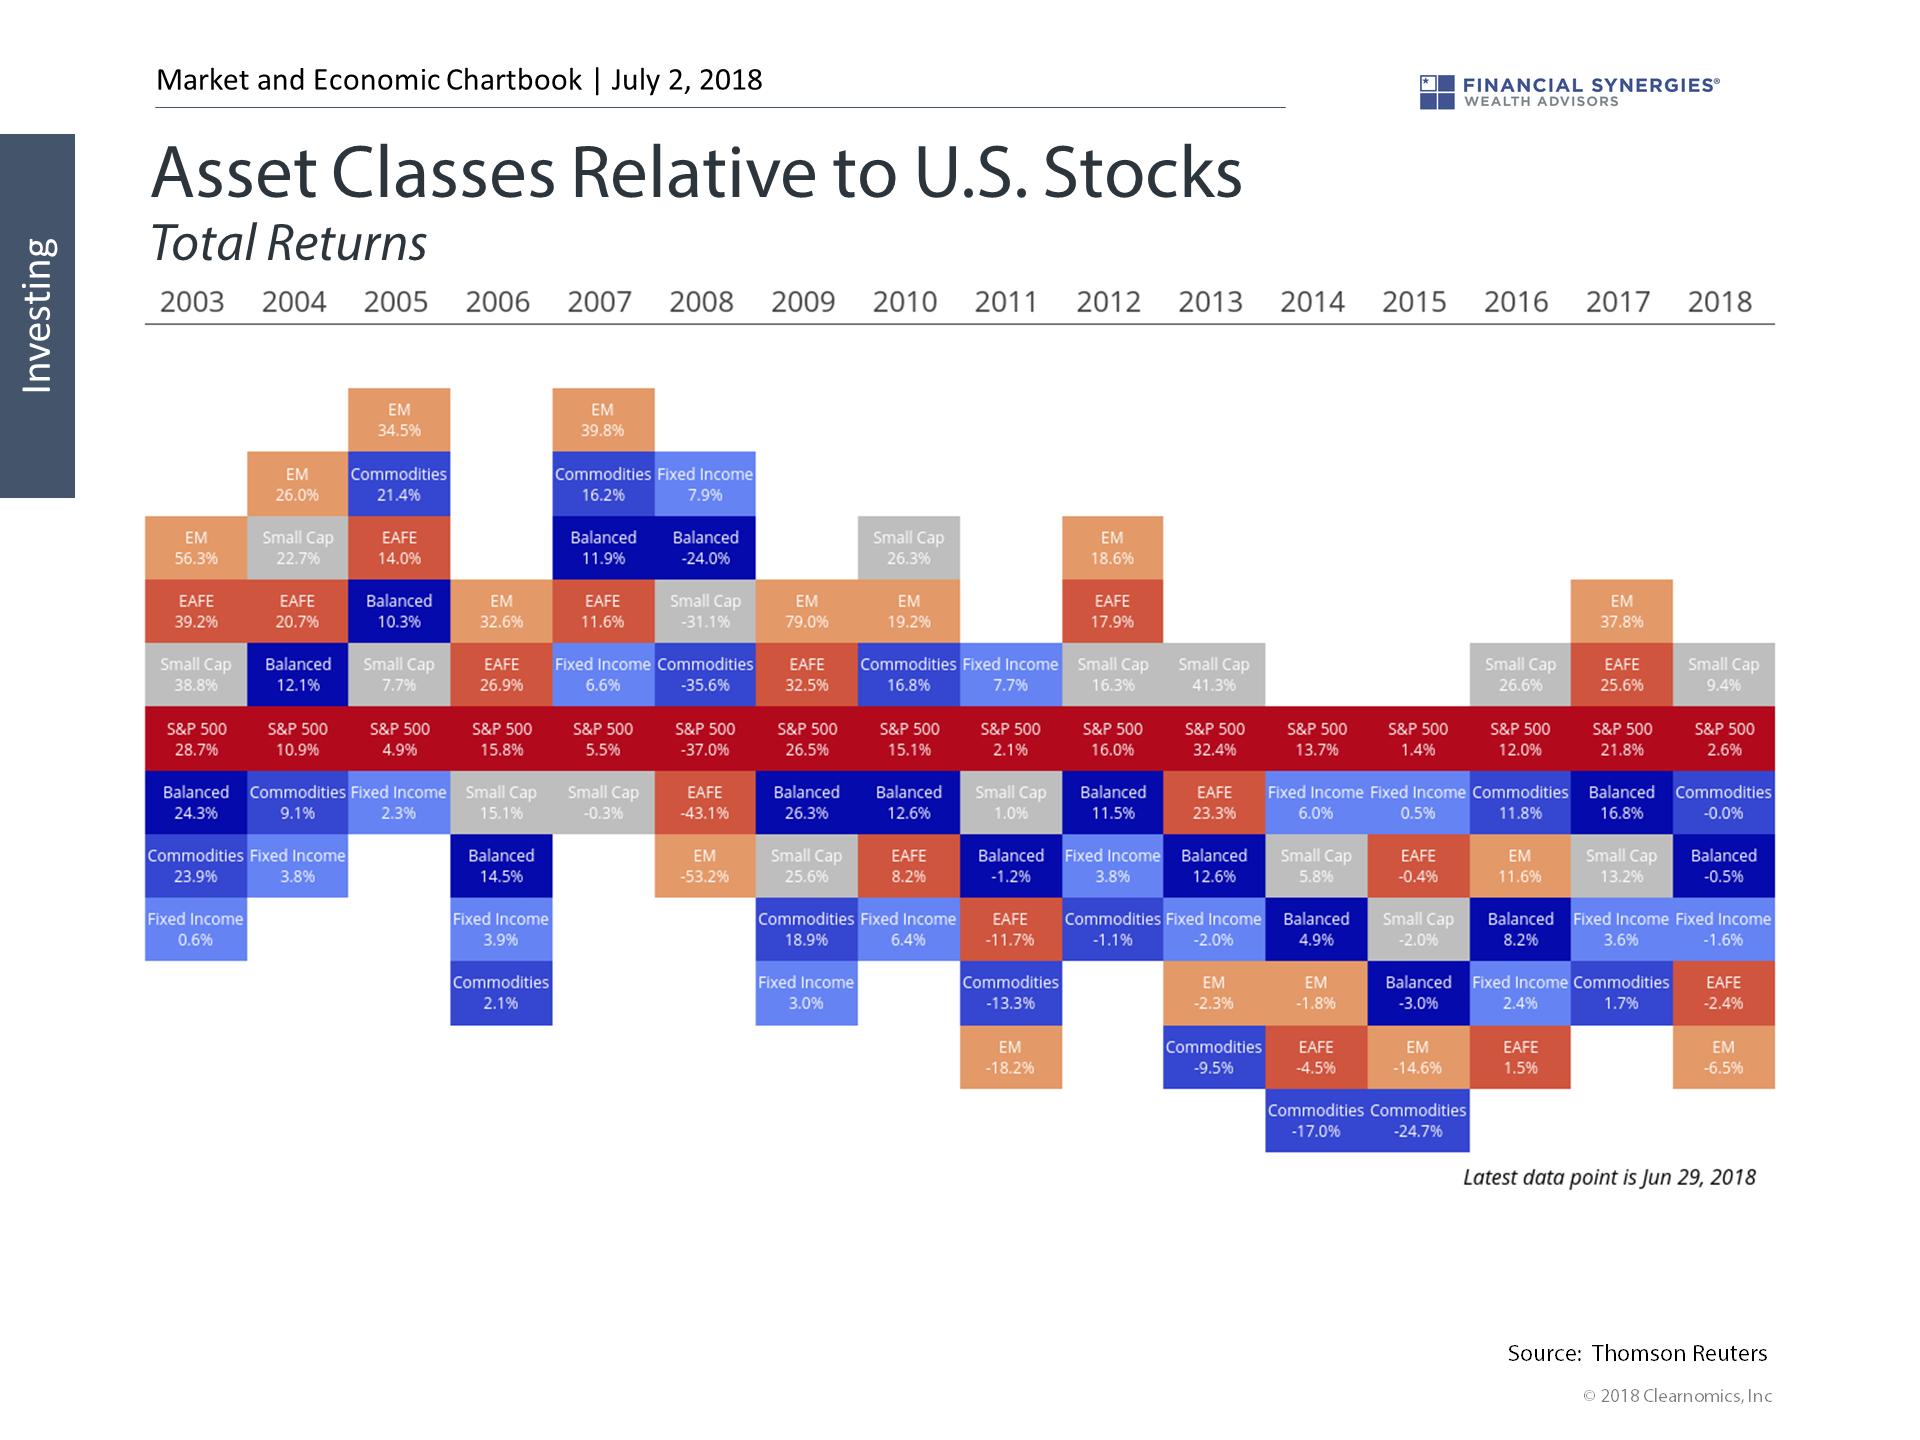 asset classes relative to u.s. stocks